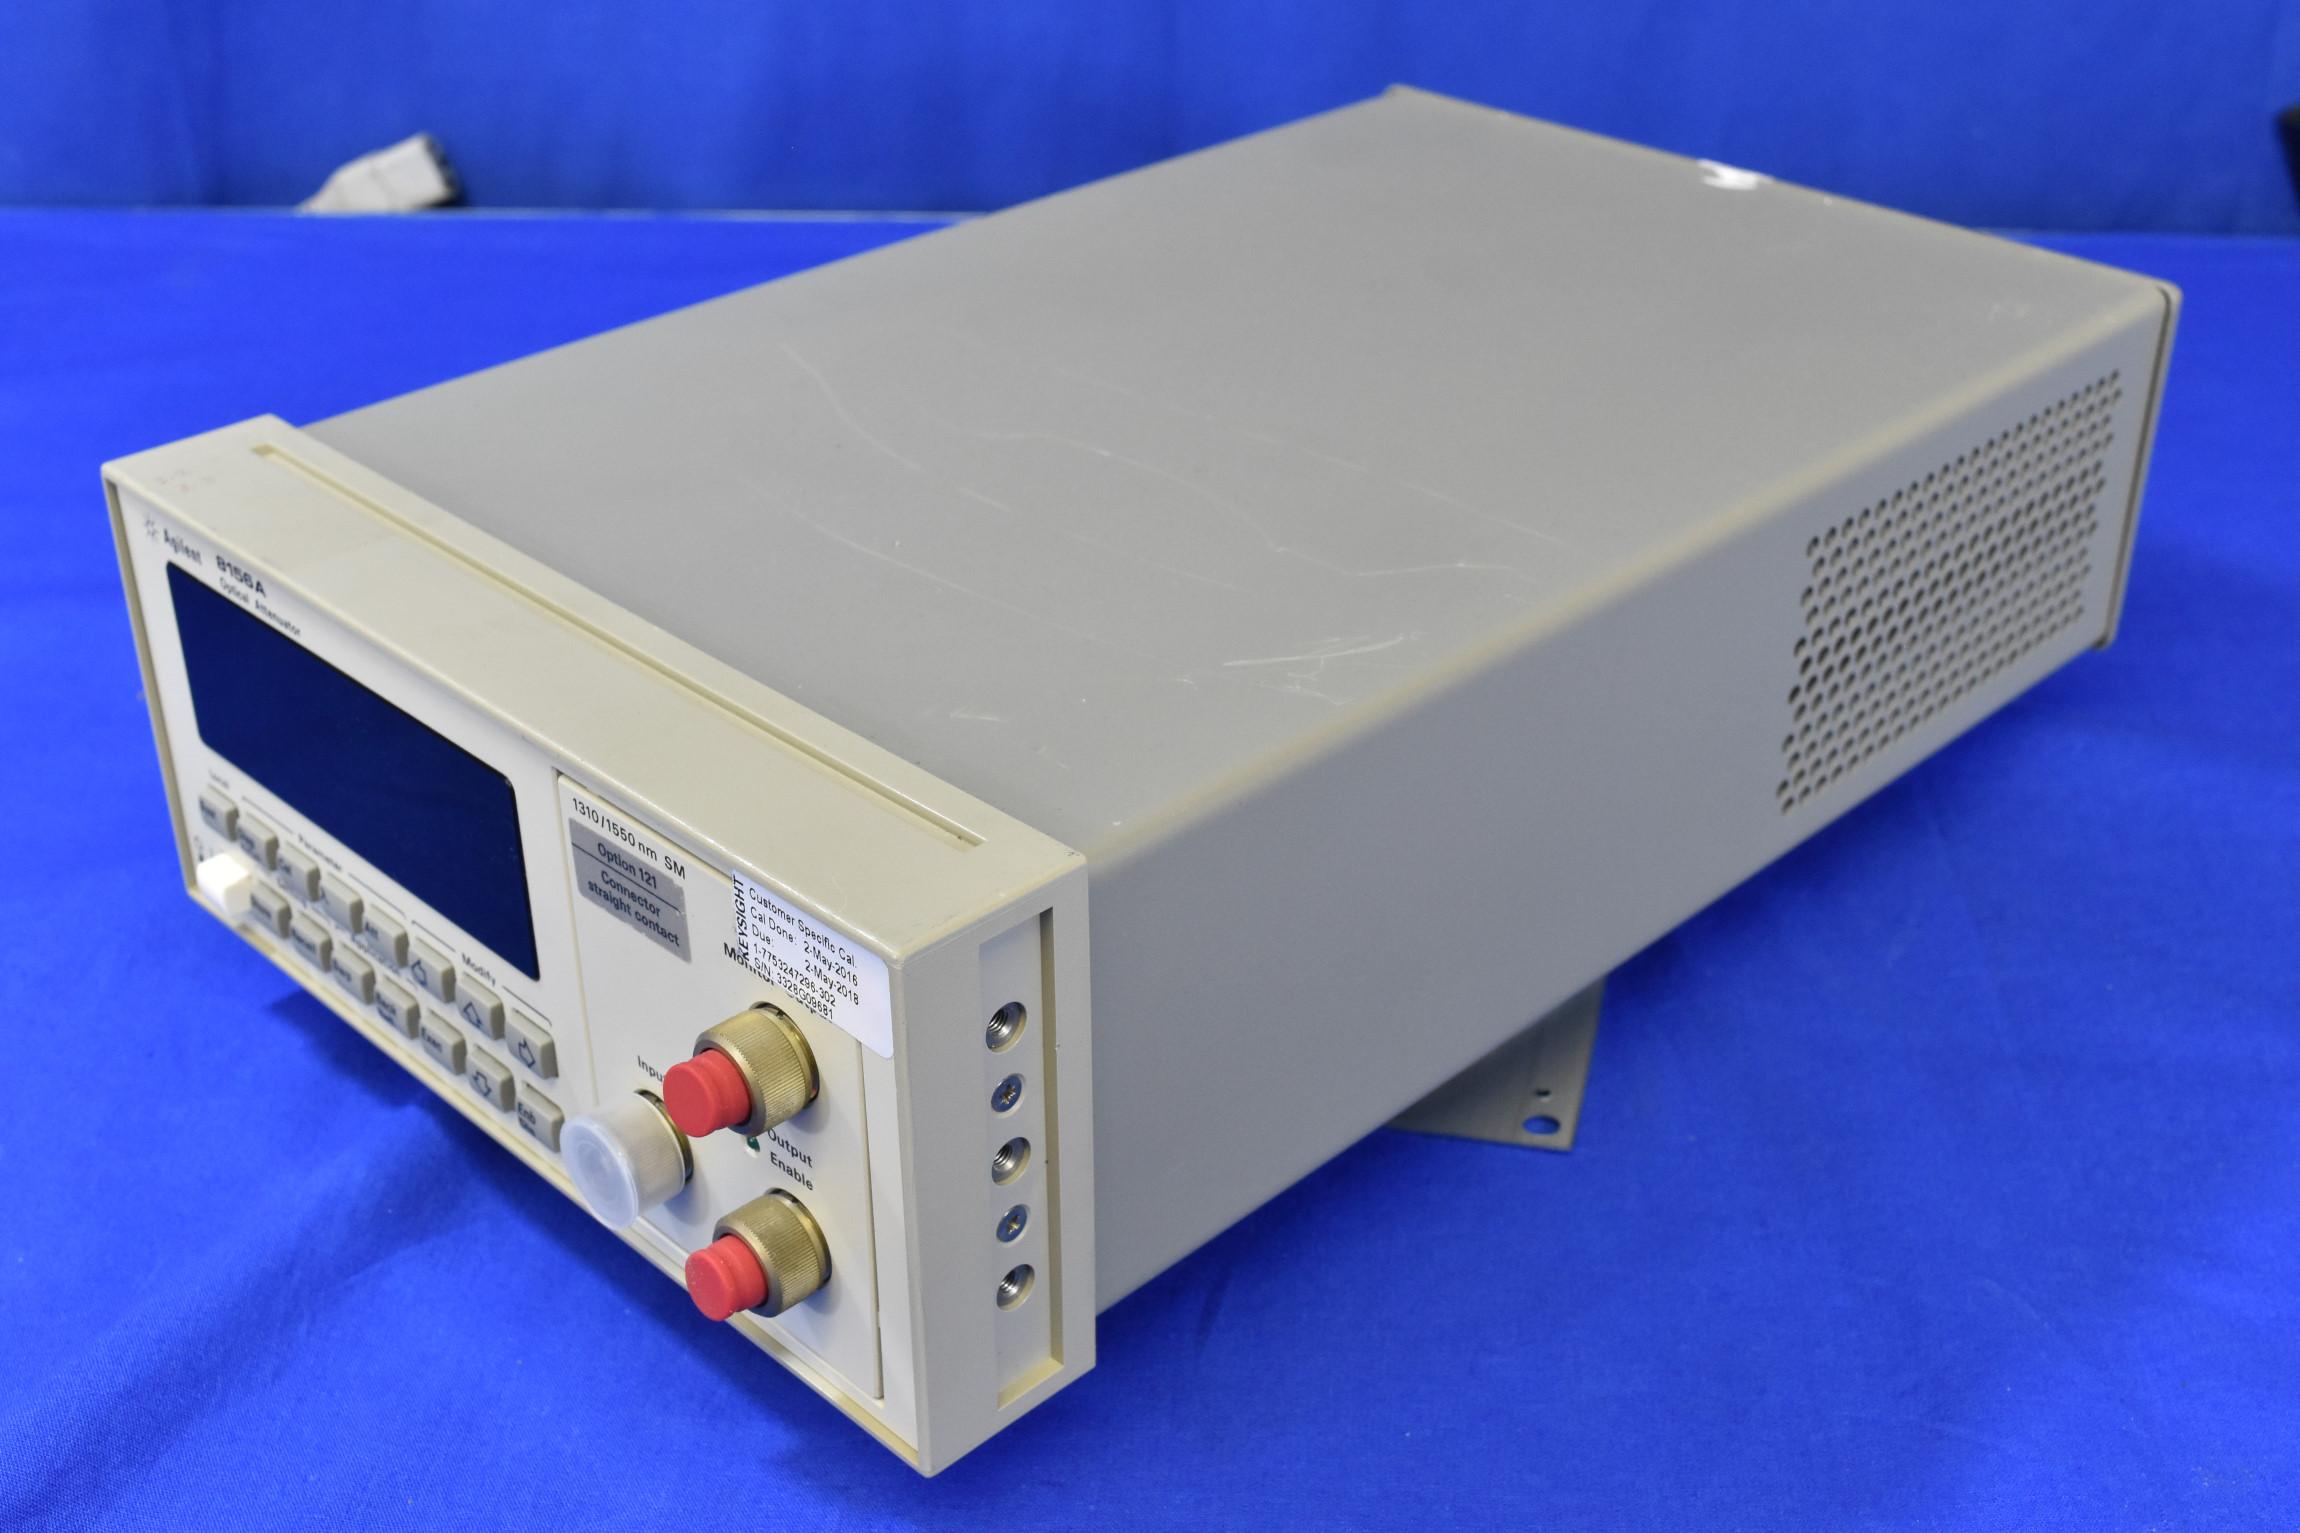 SN 580_009